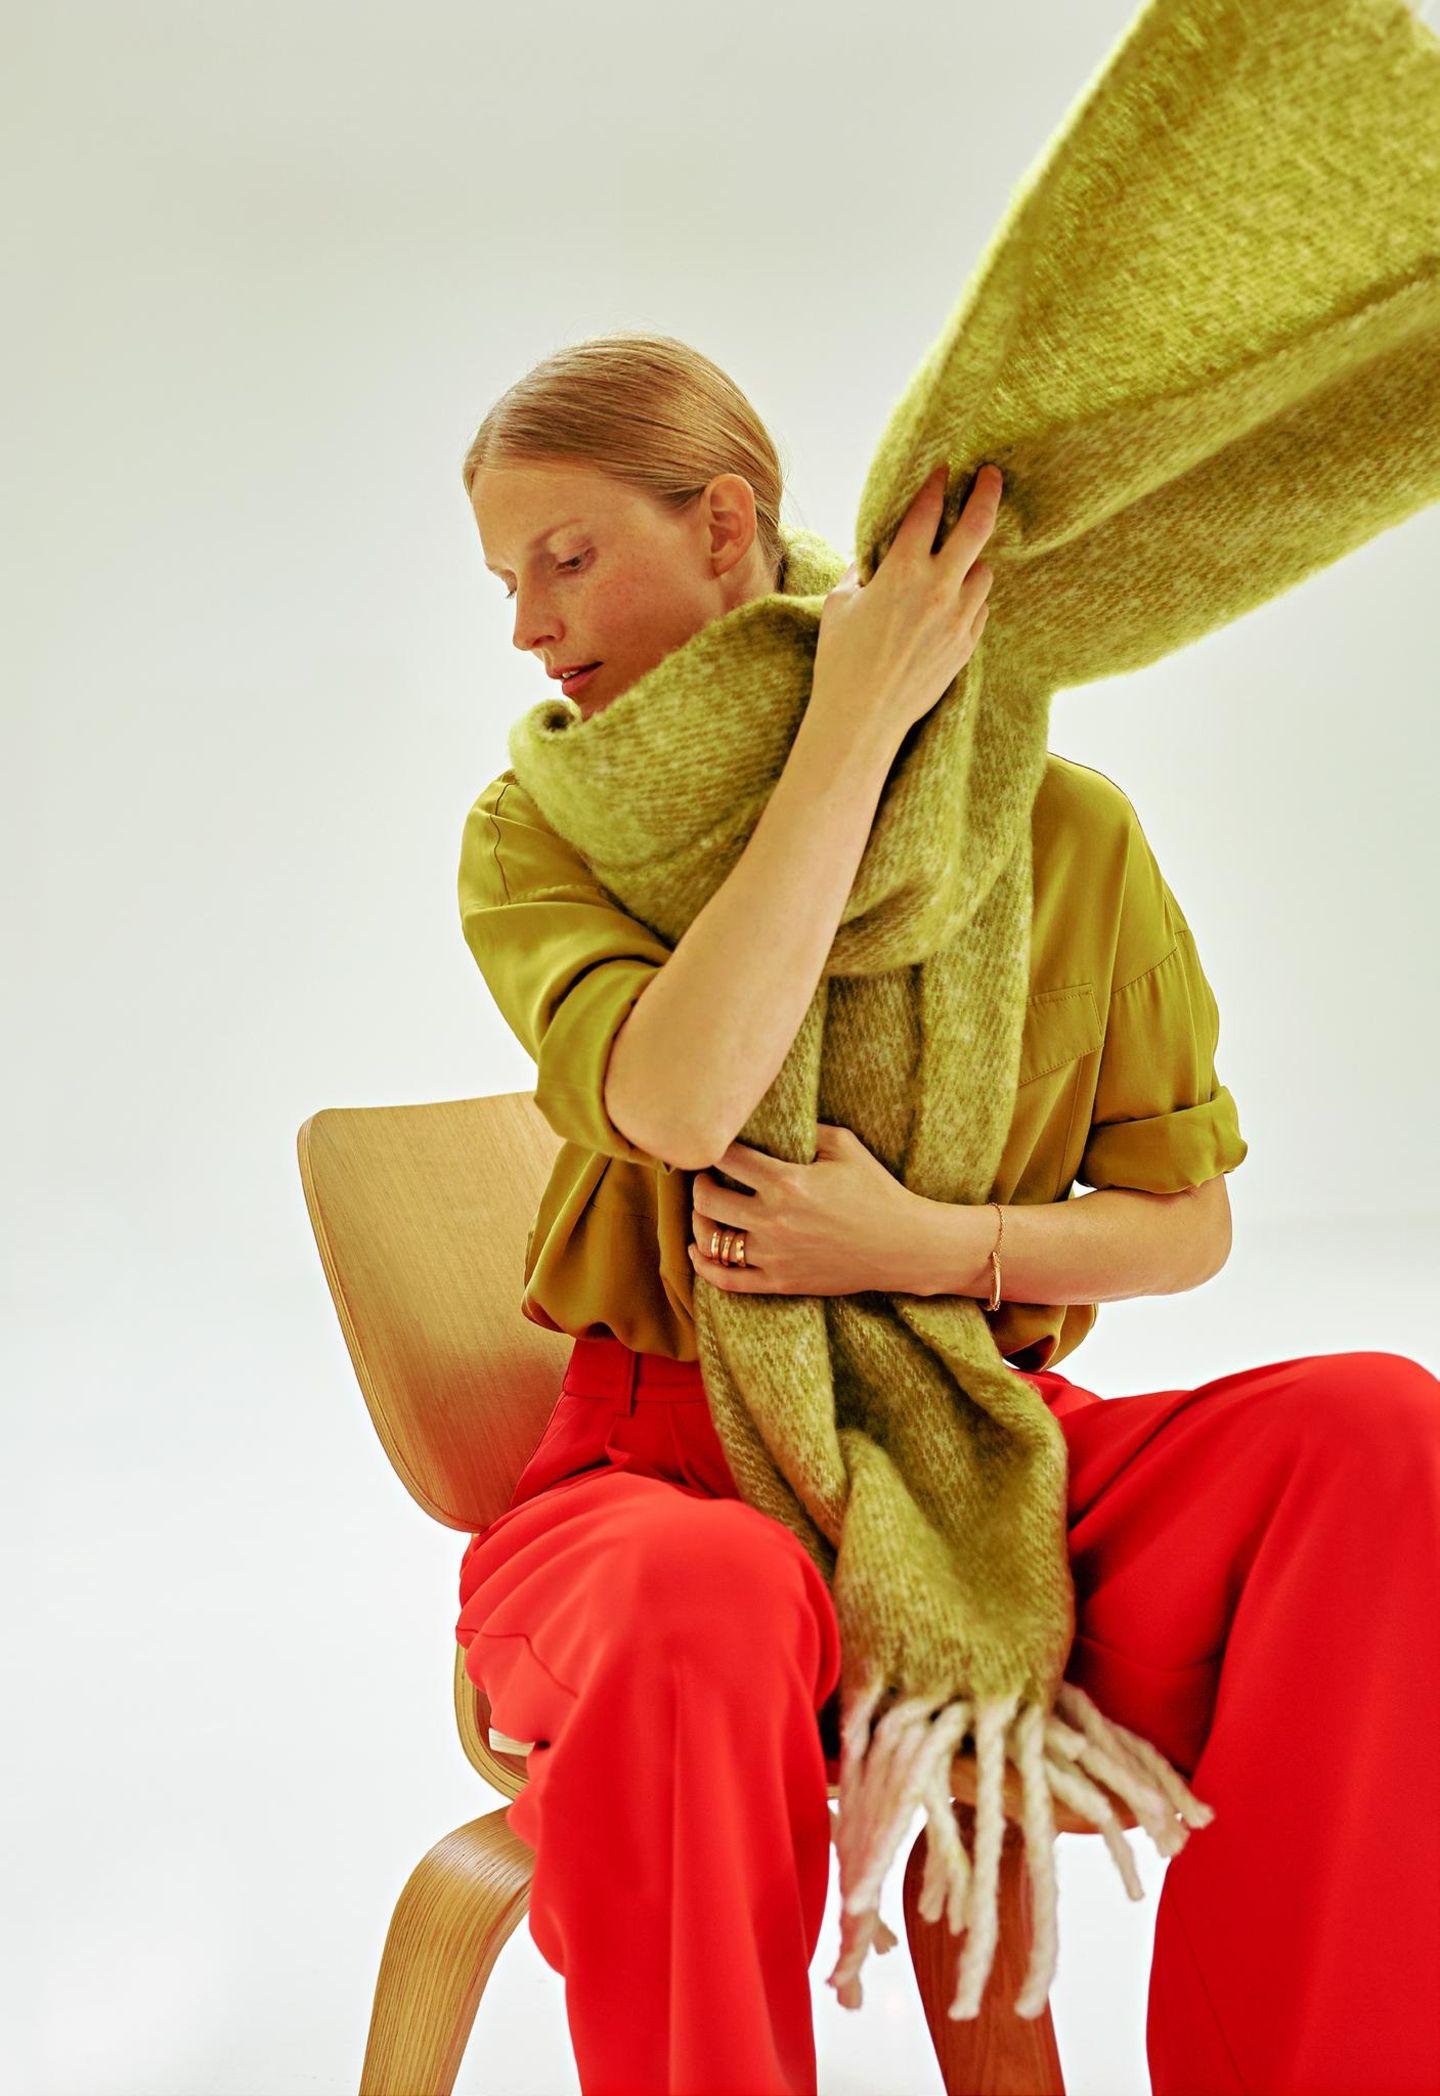 Business-Outfits 2020: Jobmode im Retro-Chic: Schal, Bluse und Palazzohose